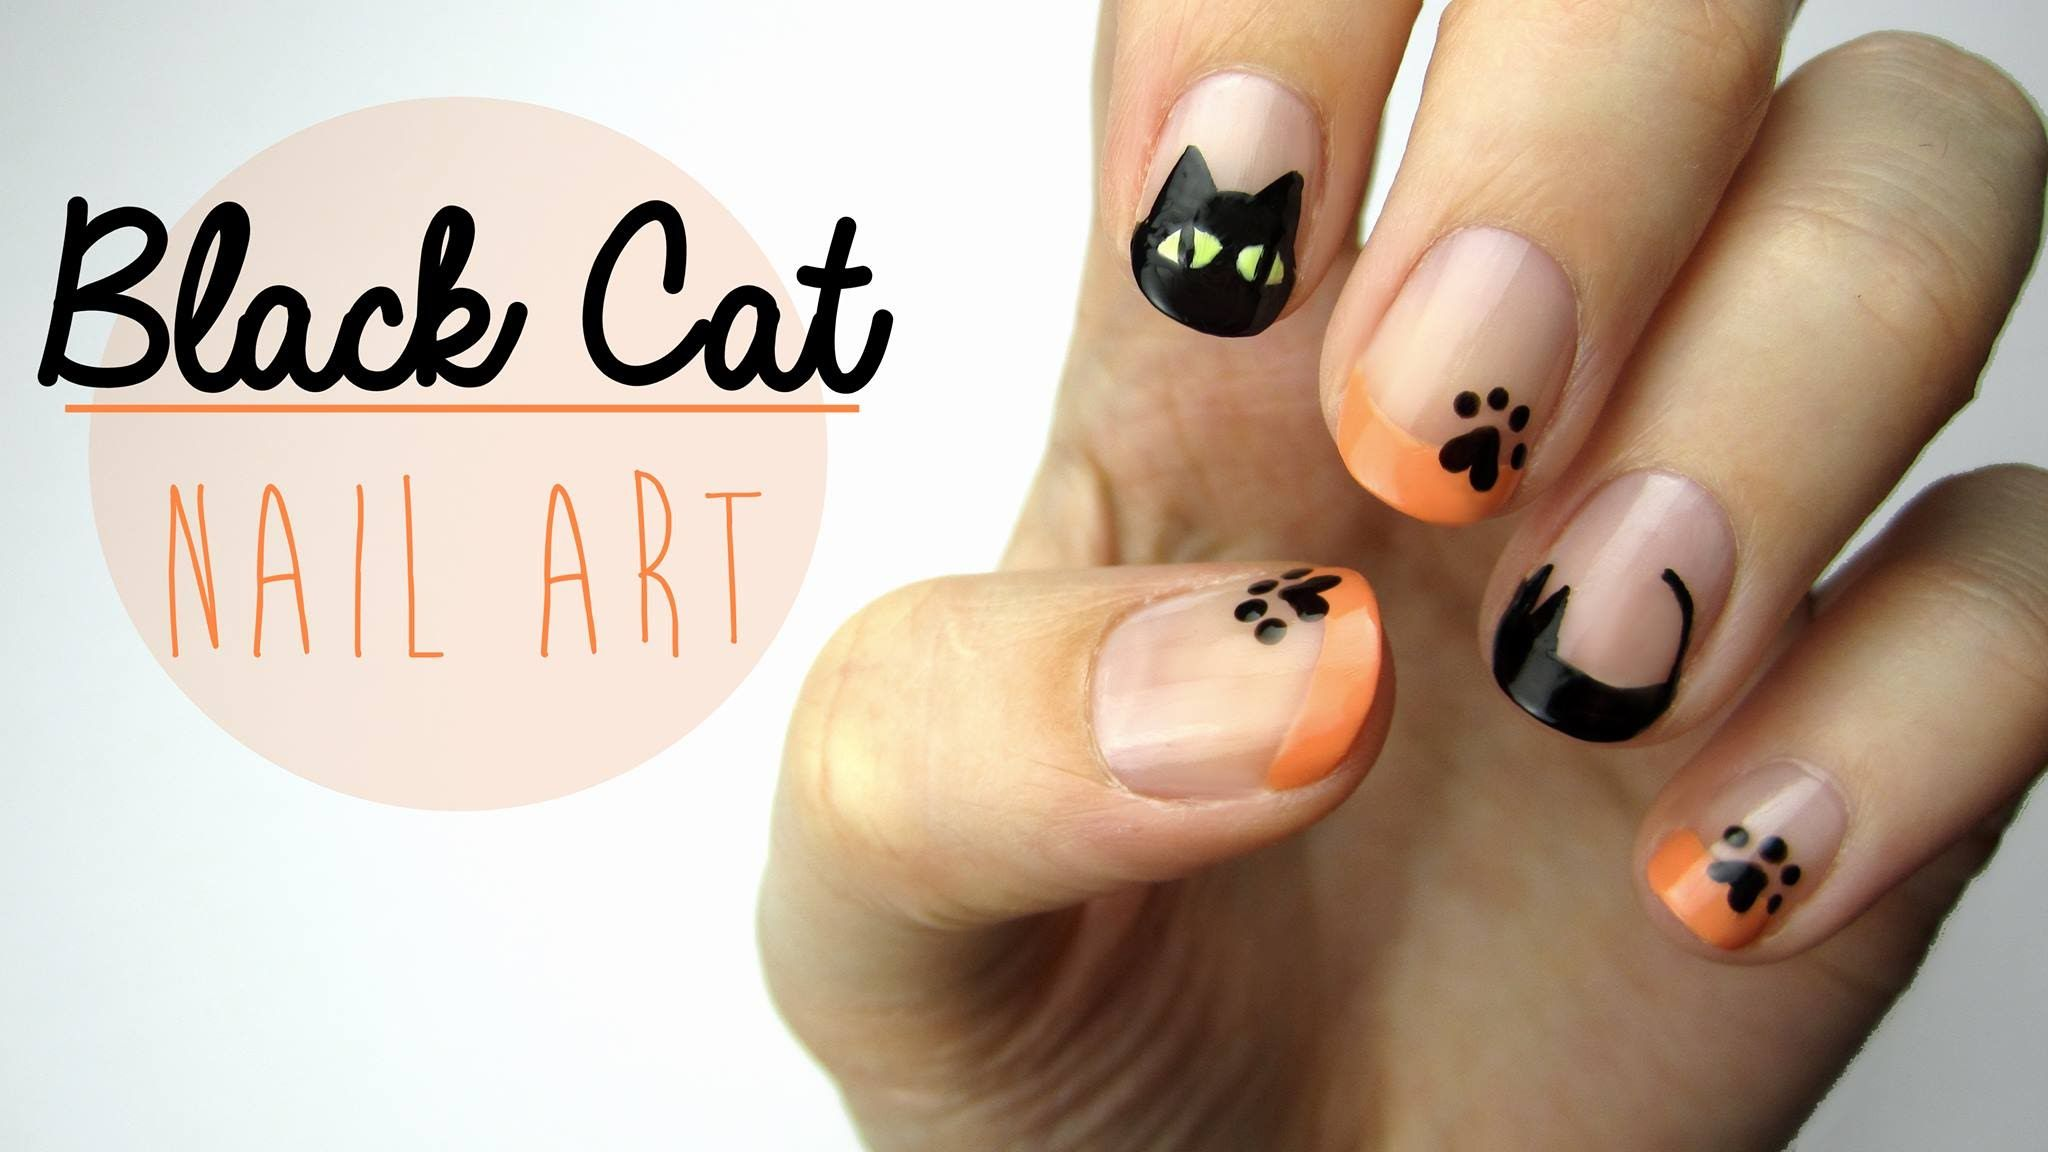 tutoriel vidéo nail art : chats noirs par cutepolish | chattes jusqu